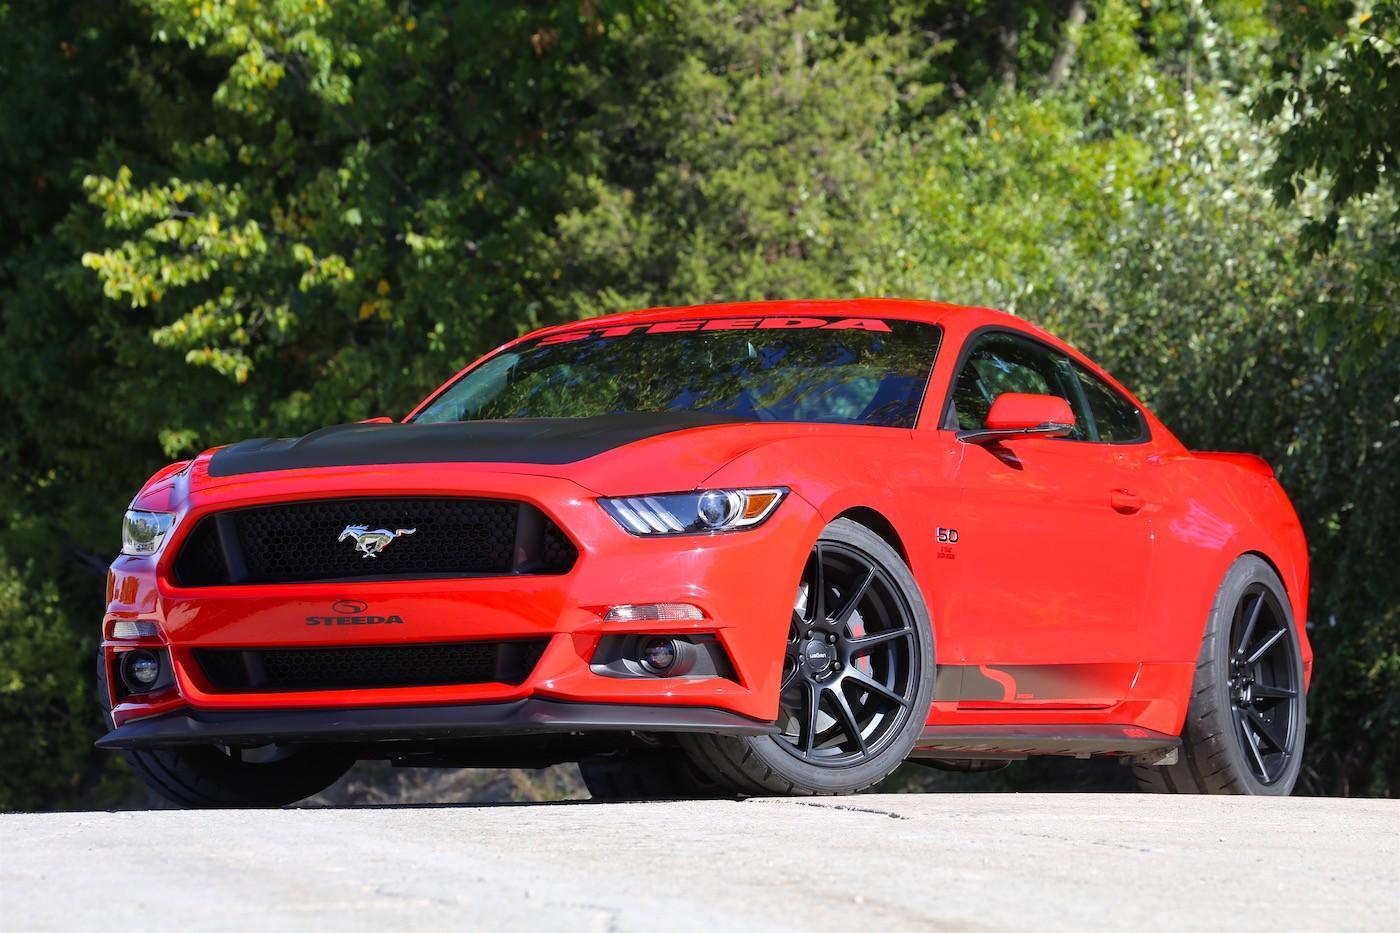 2017 Steeda Q750 StreetFighter Mustang Packs Hellcat ...